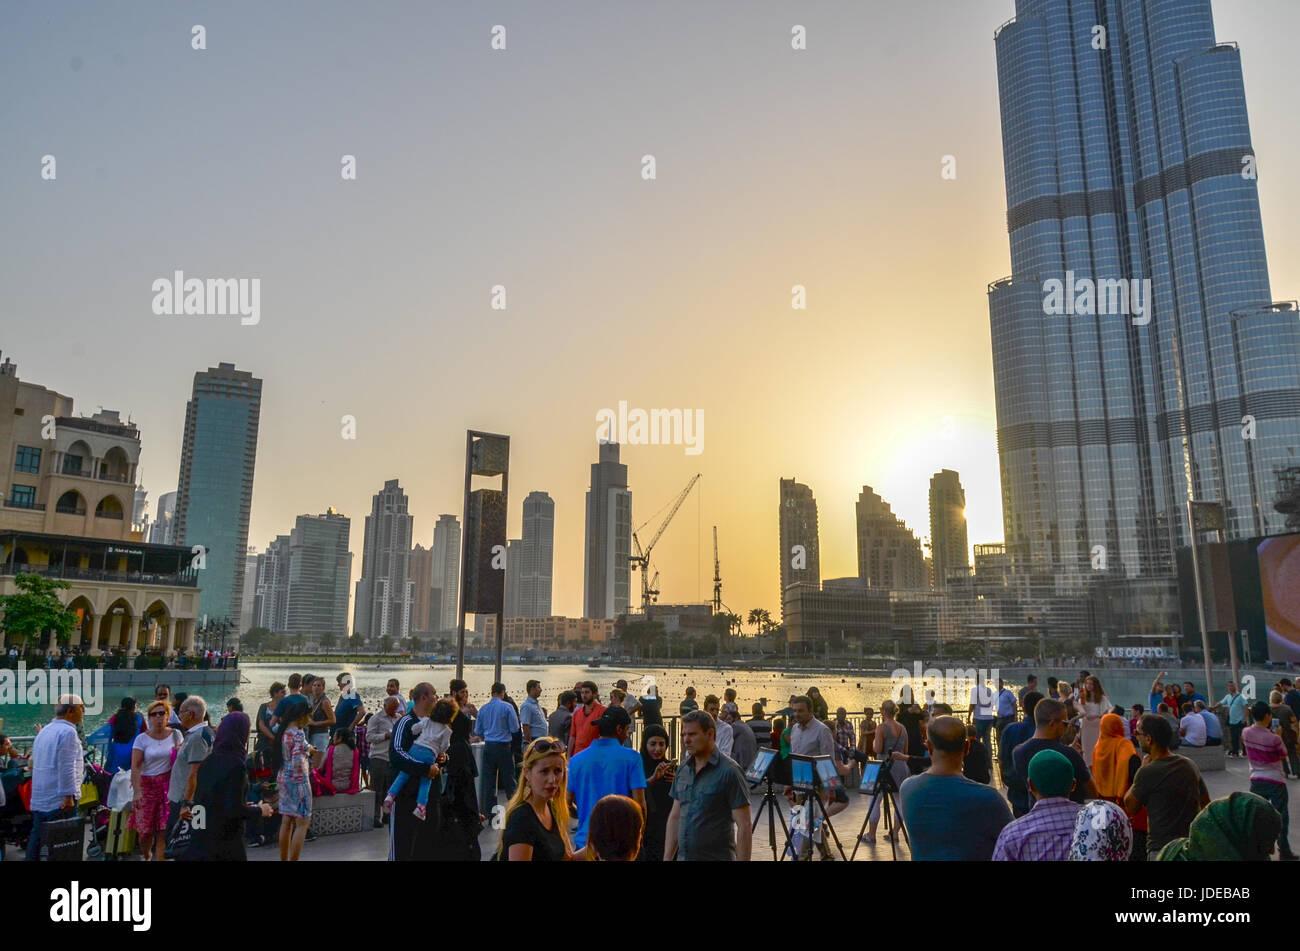 Sunset at Burj Khalifa during Water Show, Dubai Downtown, United Arab Emirates - Stock Image